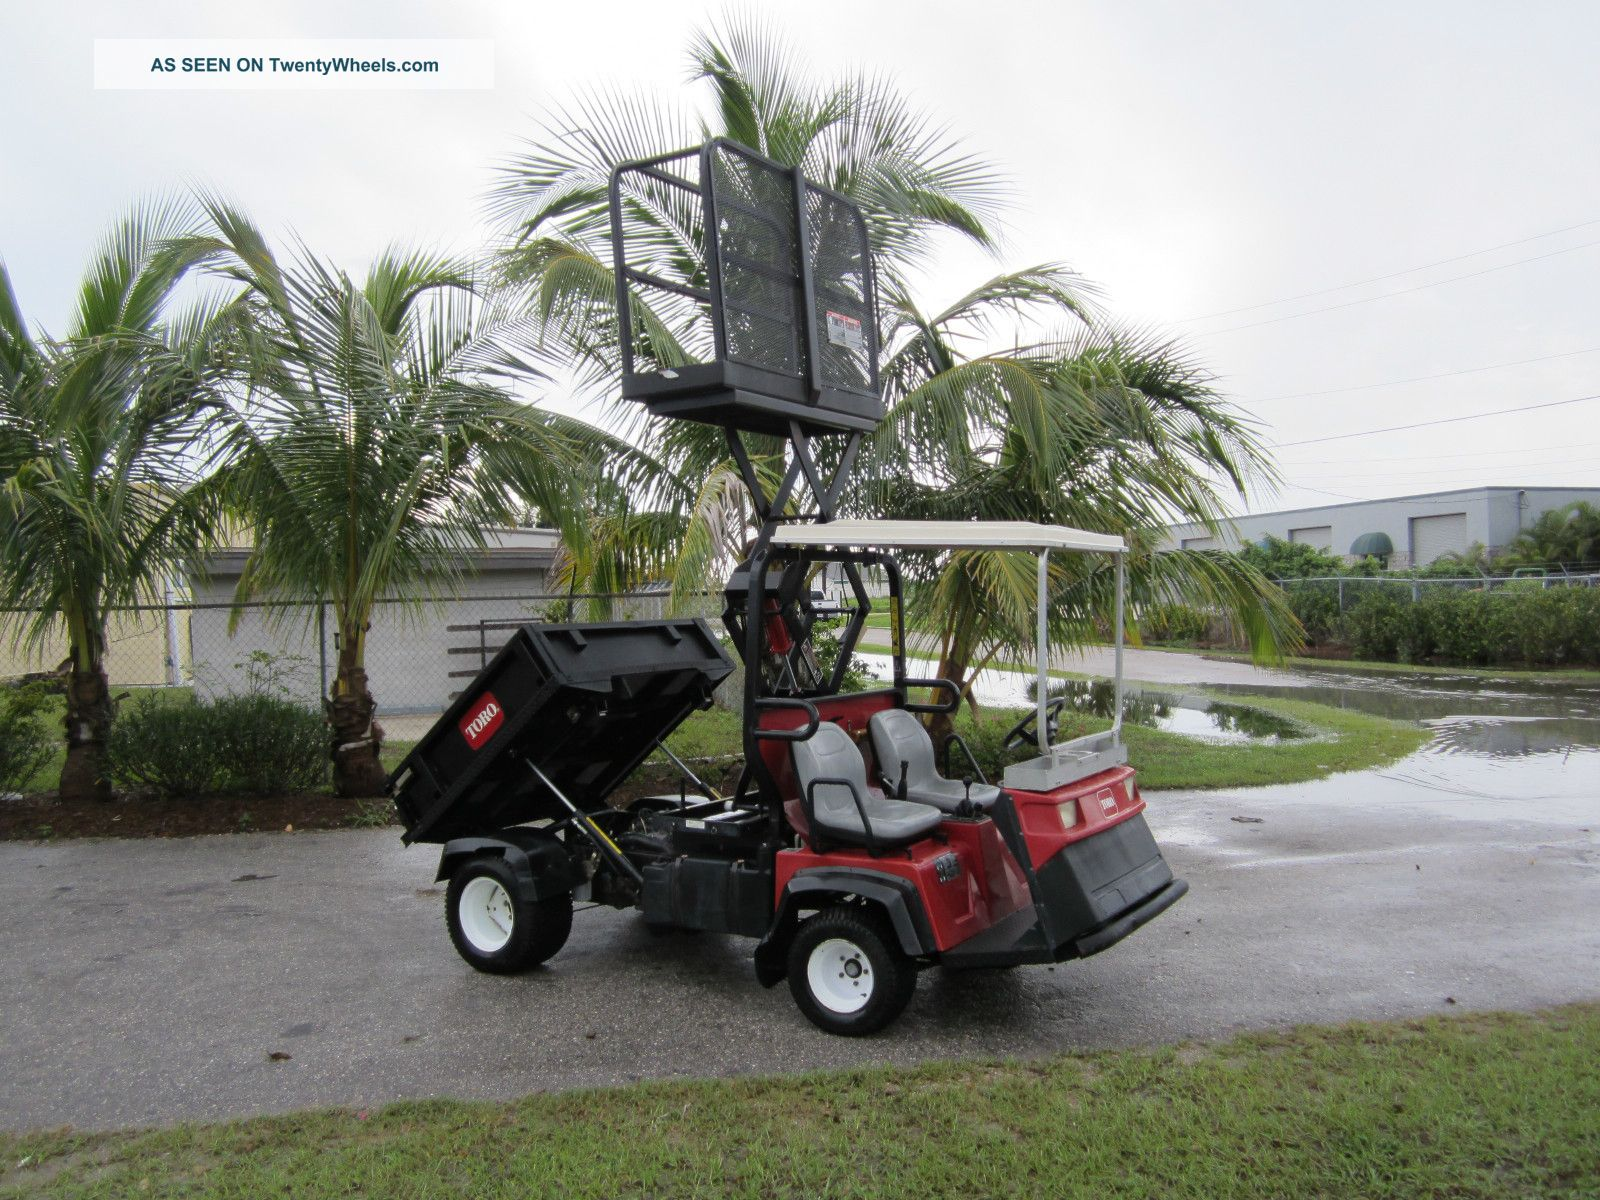 2003 Toro Workman 3200 Dump Body Scissor Lift Man Lift 1525 Hrs. Utility Vehicles photo